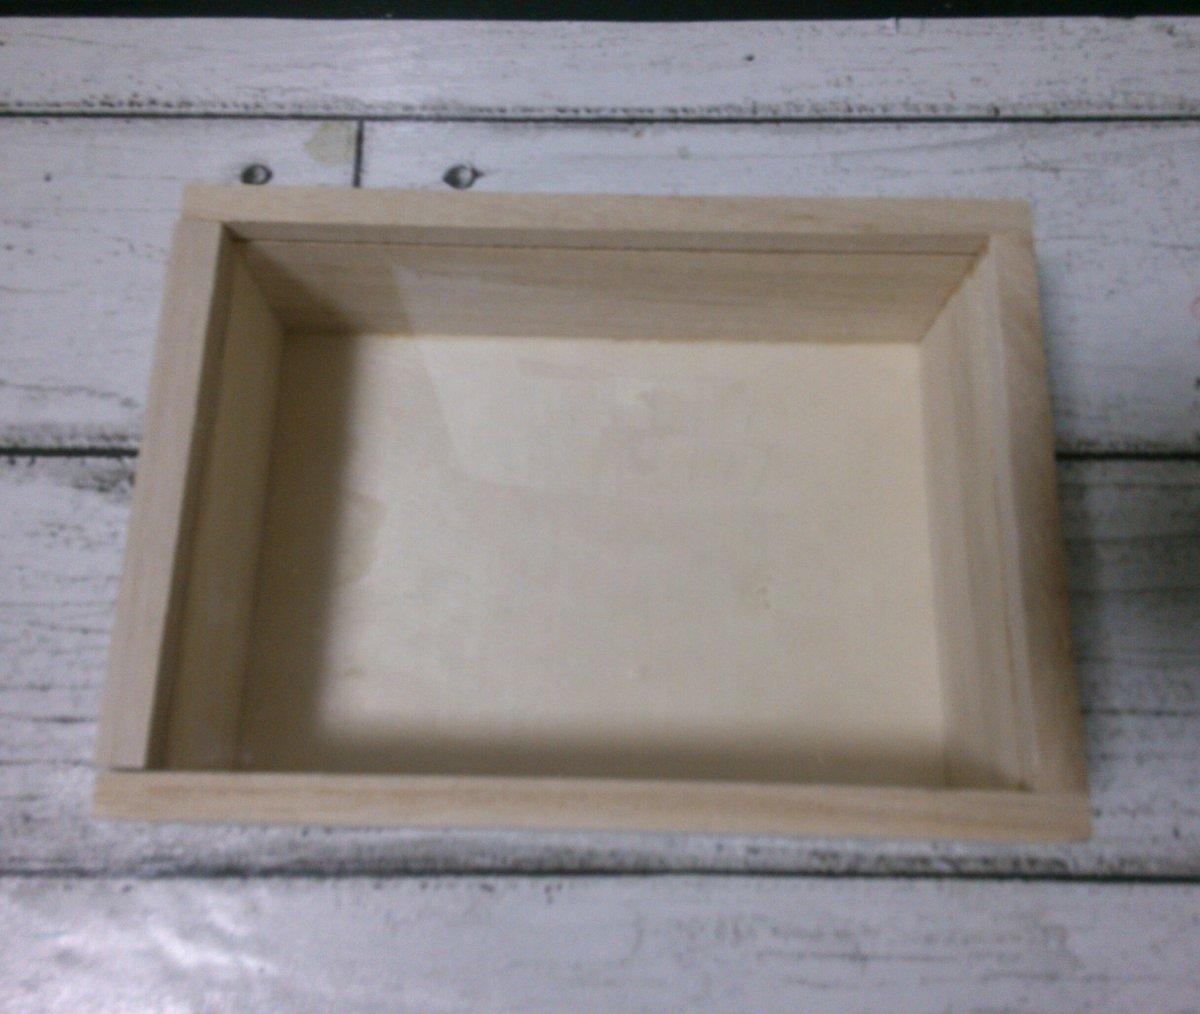 test ツイッターメディア - キャンドゥにあった木製ディスプレイボックス!夜更かしして作ろう。  #キャンドゥ #Can★Do #木製ディスプレイボックス https://t.co/peJBHhPpWe